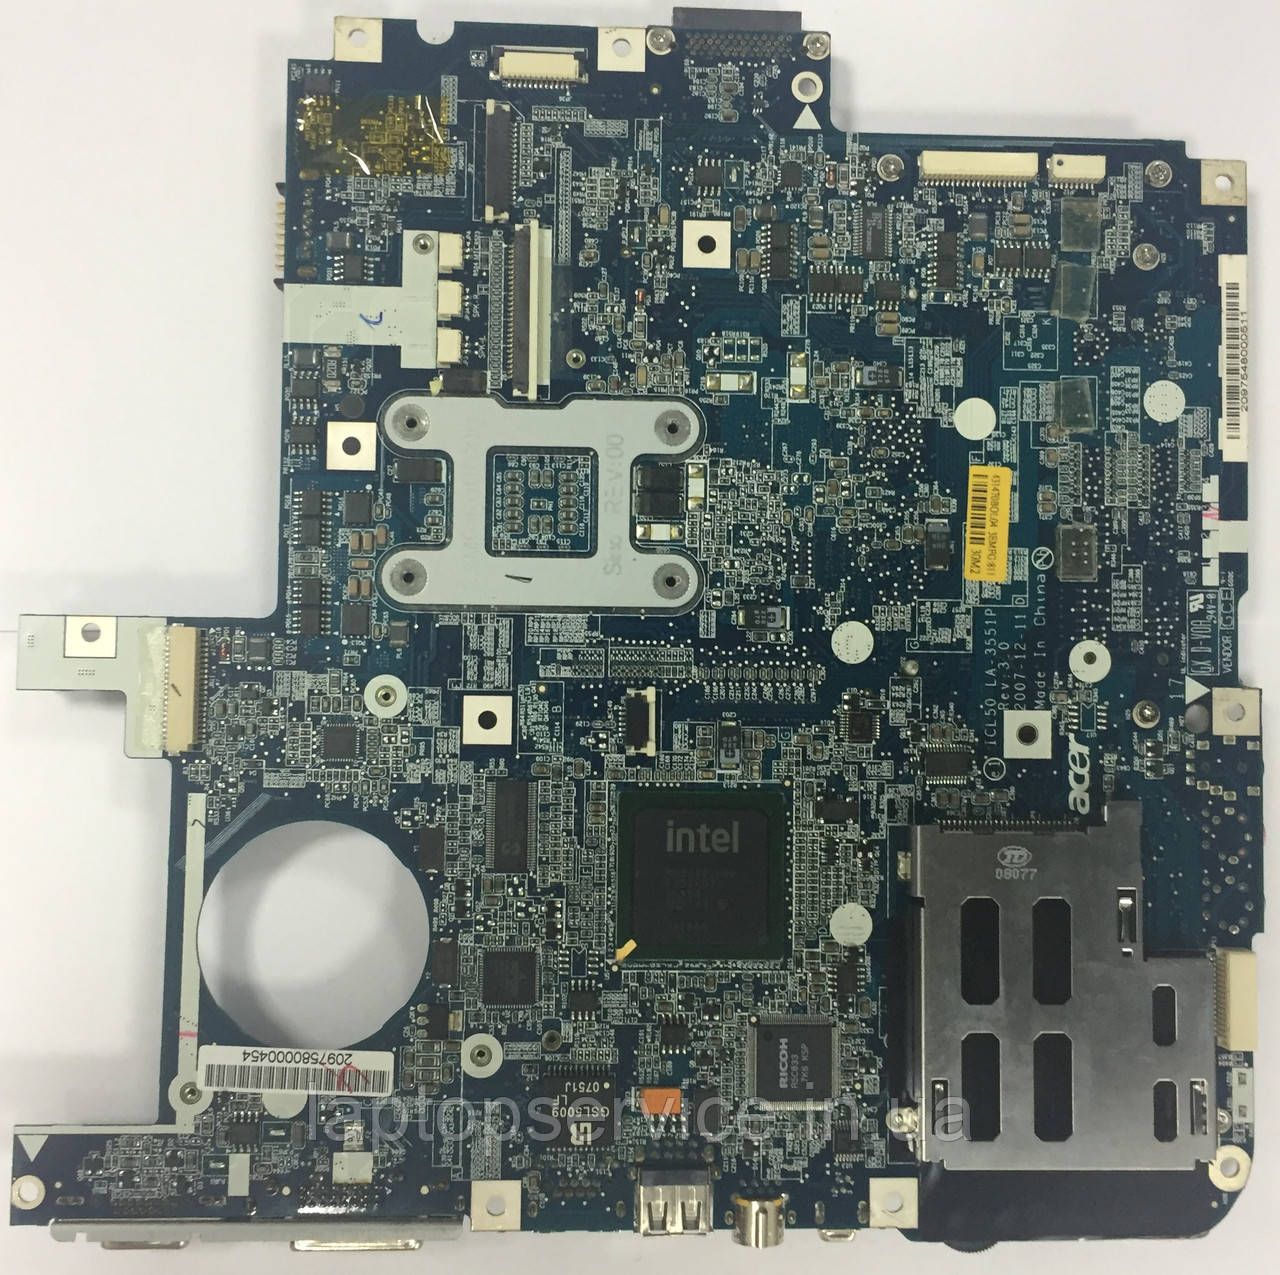 Acer Aspire 5710ZG VGA Drivers for Windows 10